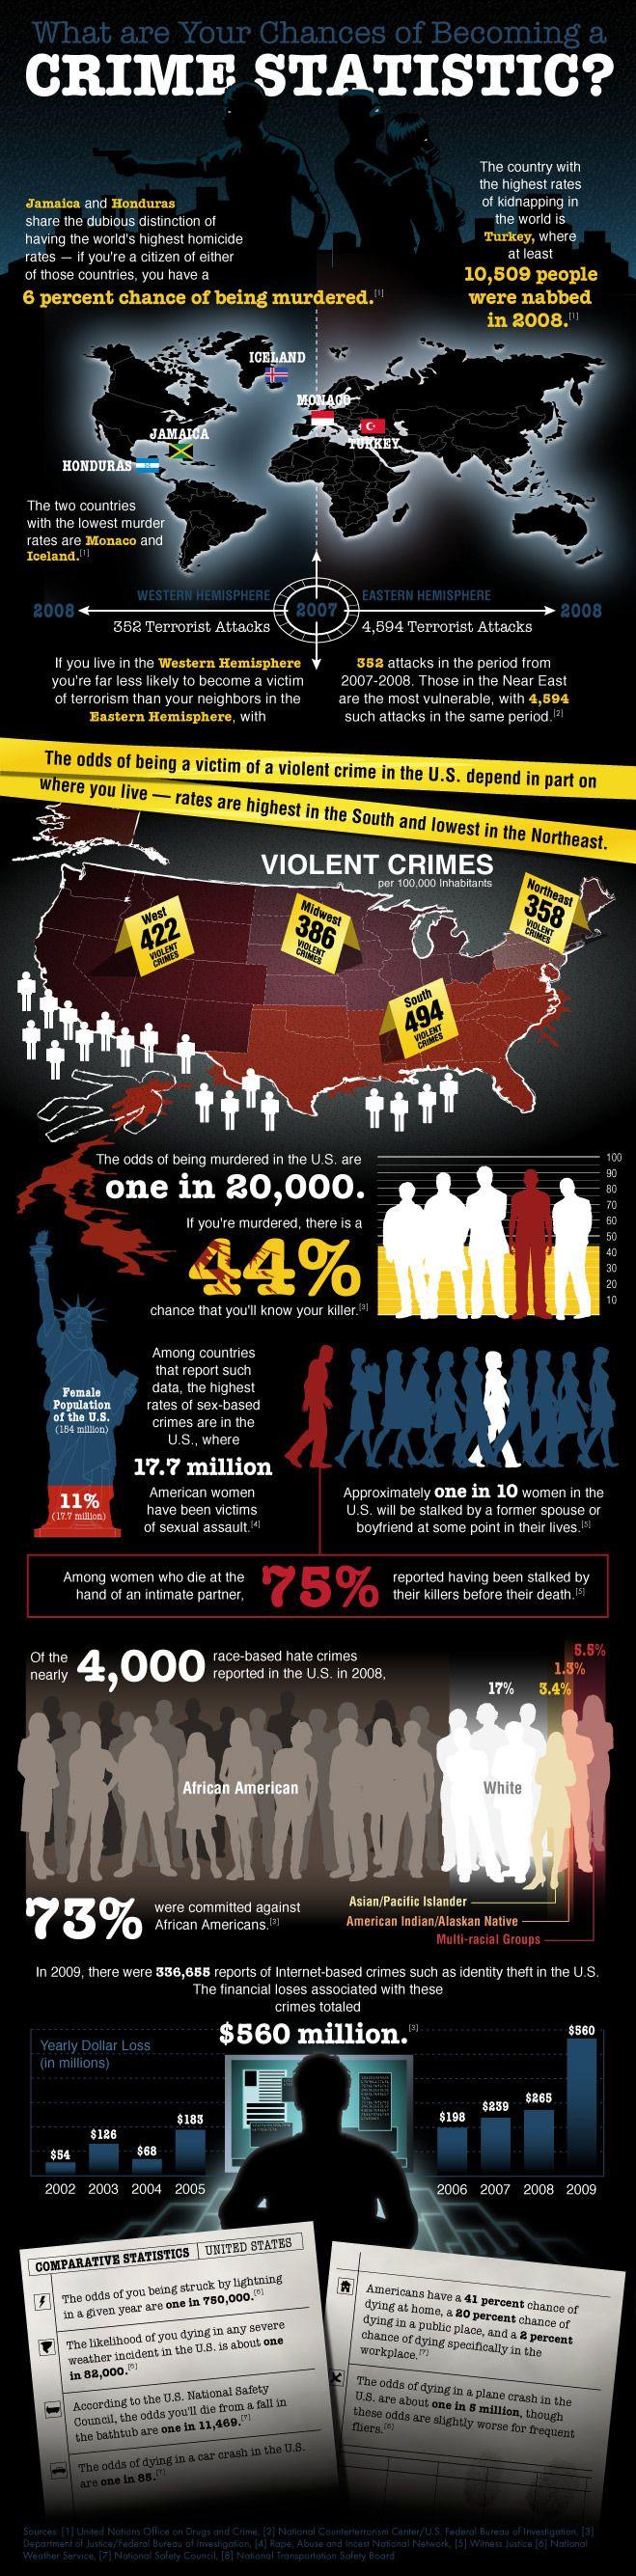 @Liz Mester Mester Sanders crime infographic.